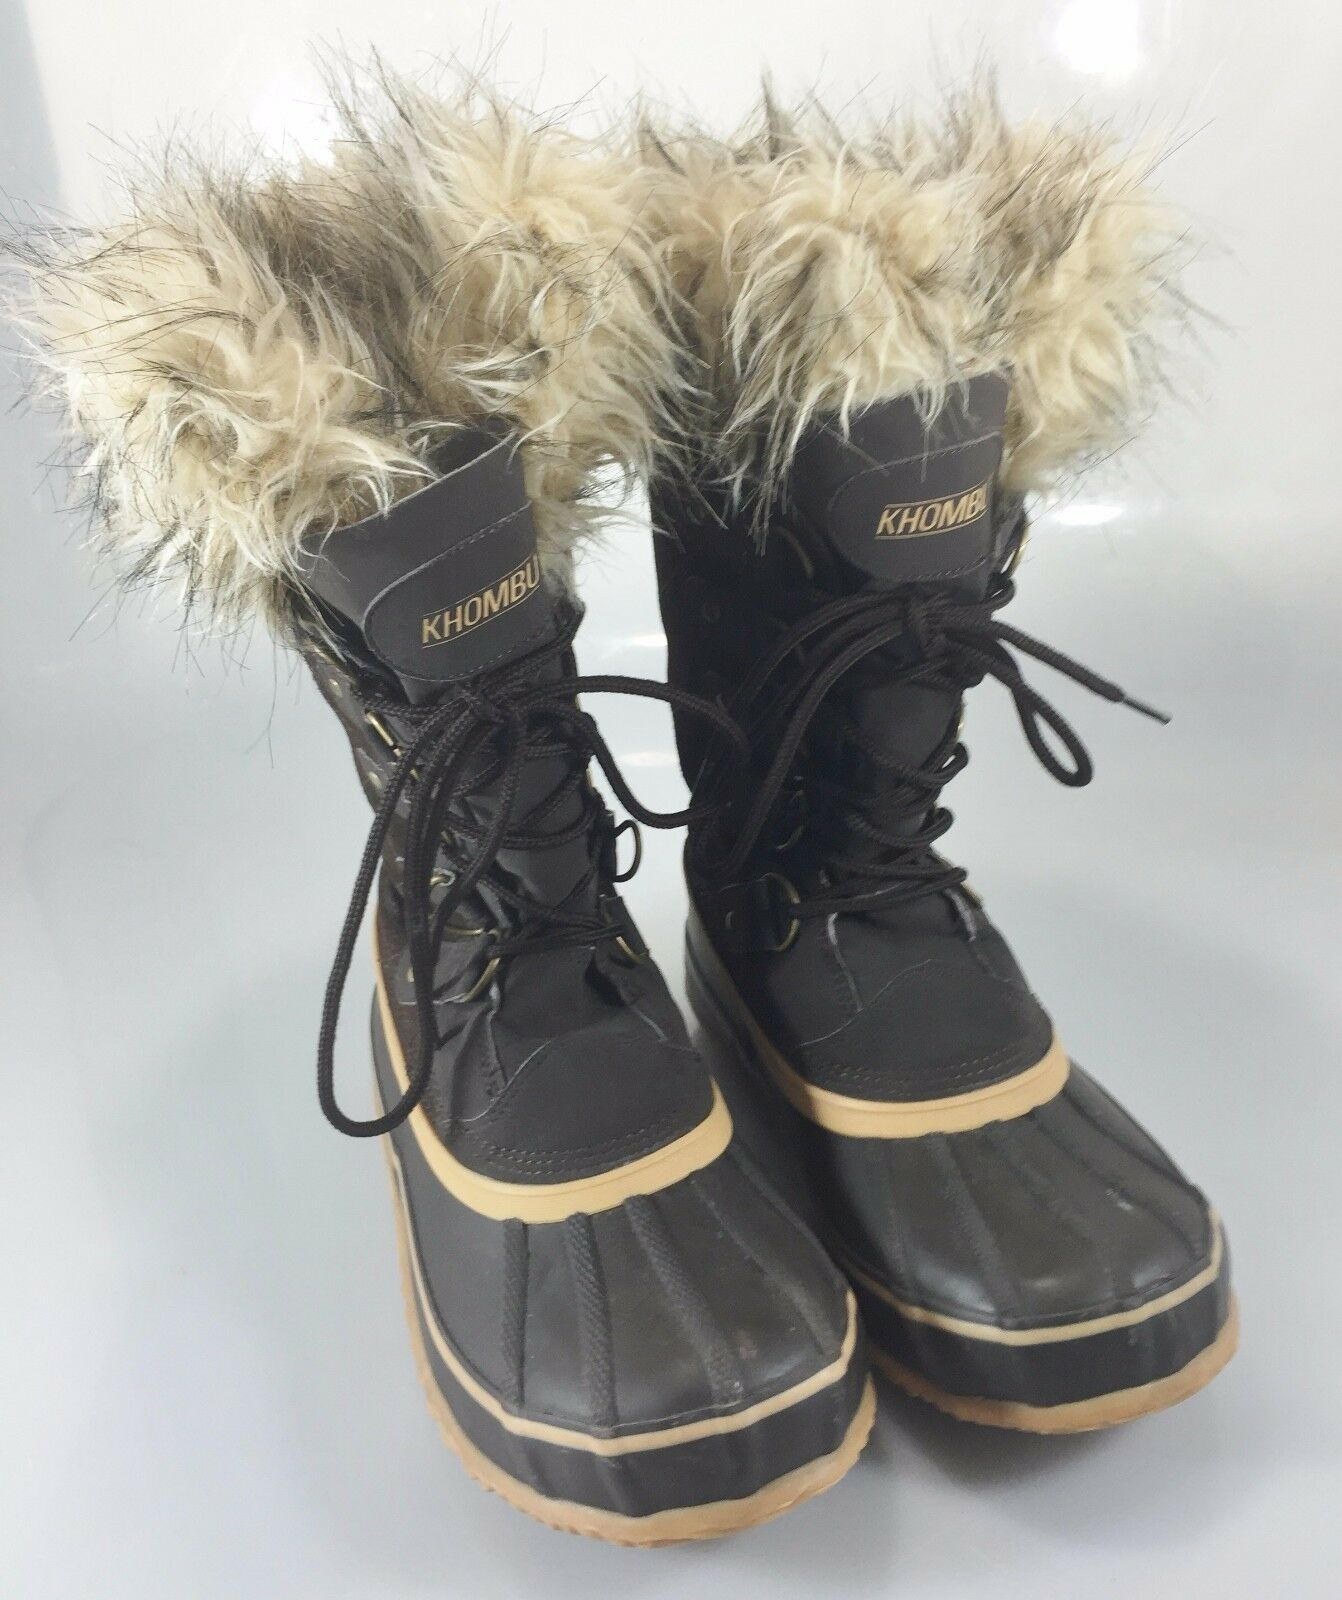 Khombu Damenschuhe Faux 9 M Winter Duck Stiefel Braun Faux Damenschuhe Fur Steel Shank 975758